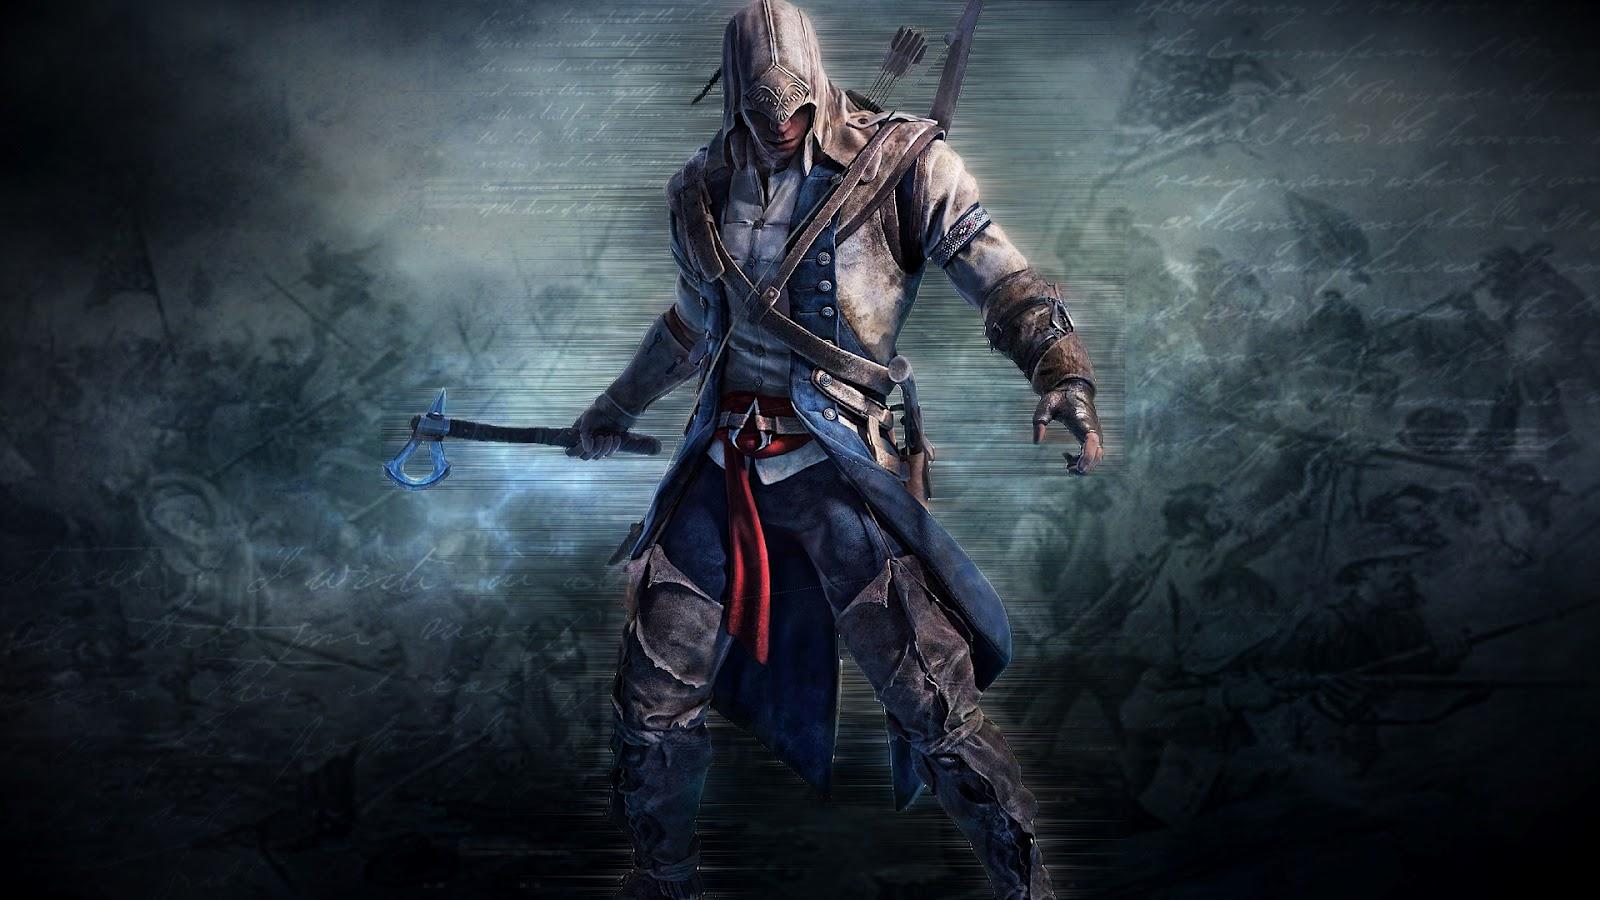 Assassin S Creed Wallpaper Hd 1080p Wallpapersafari